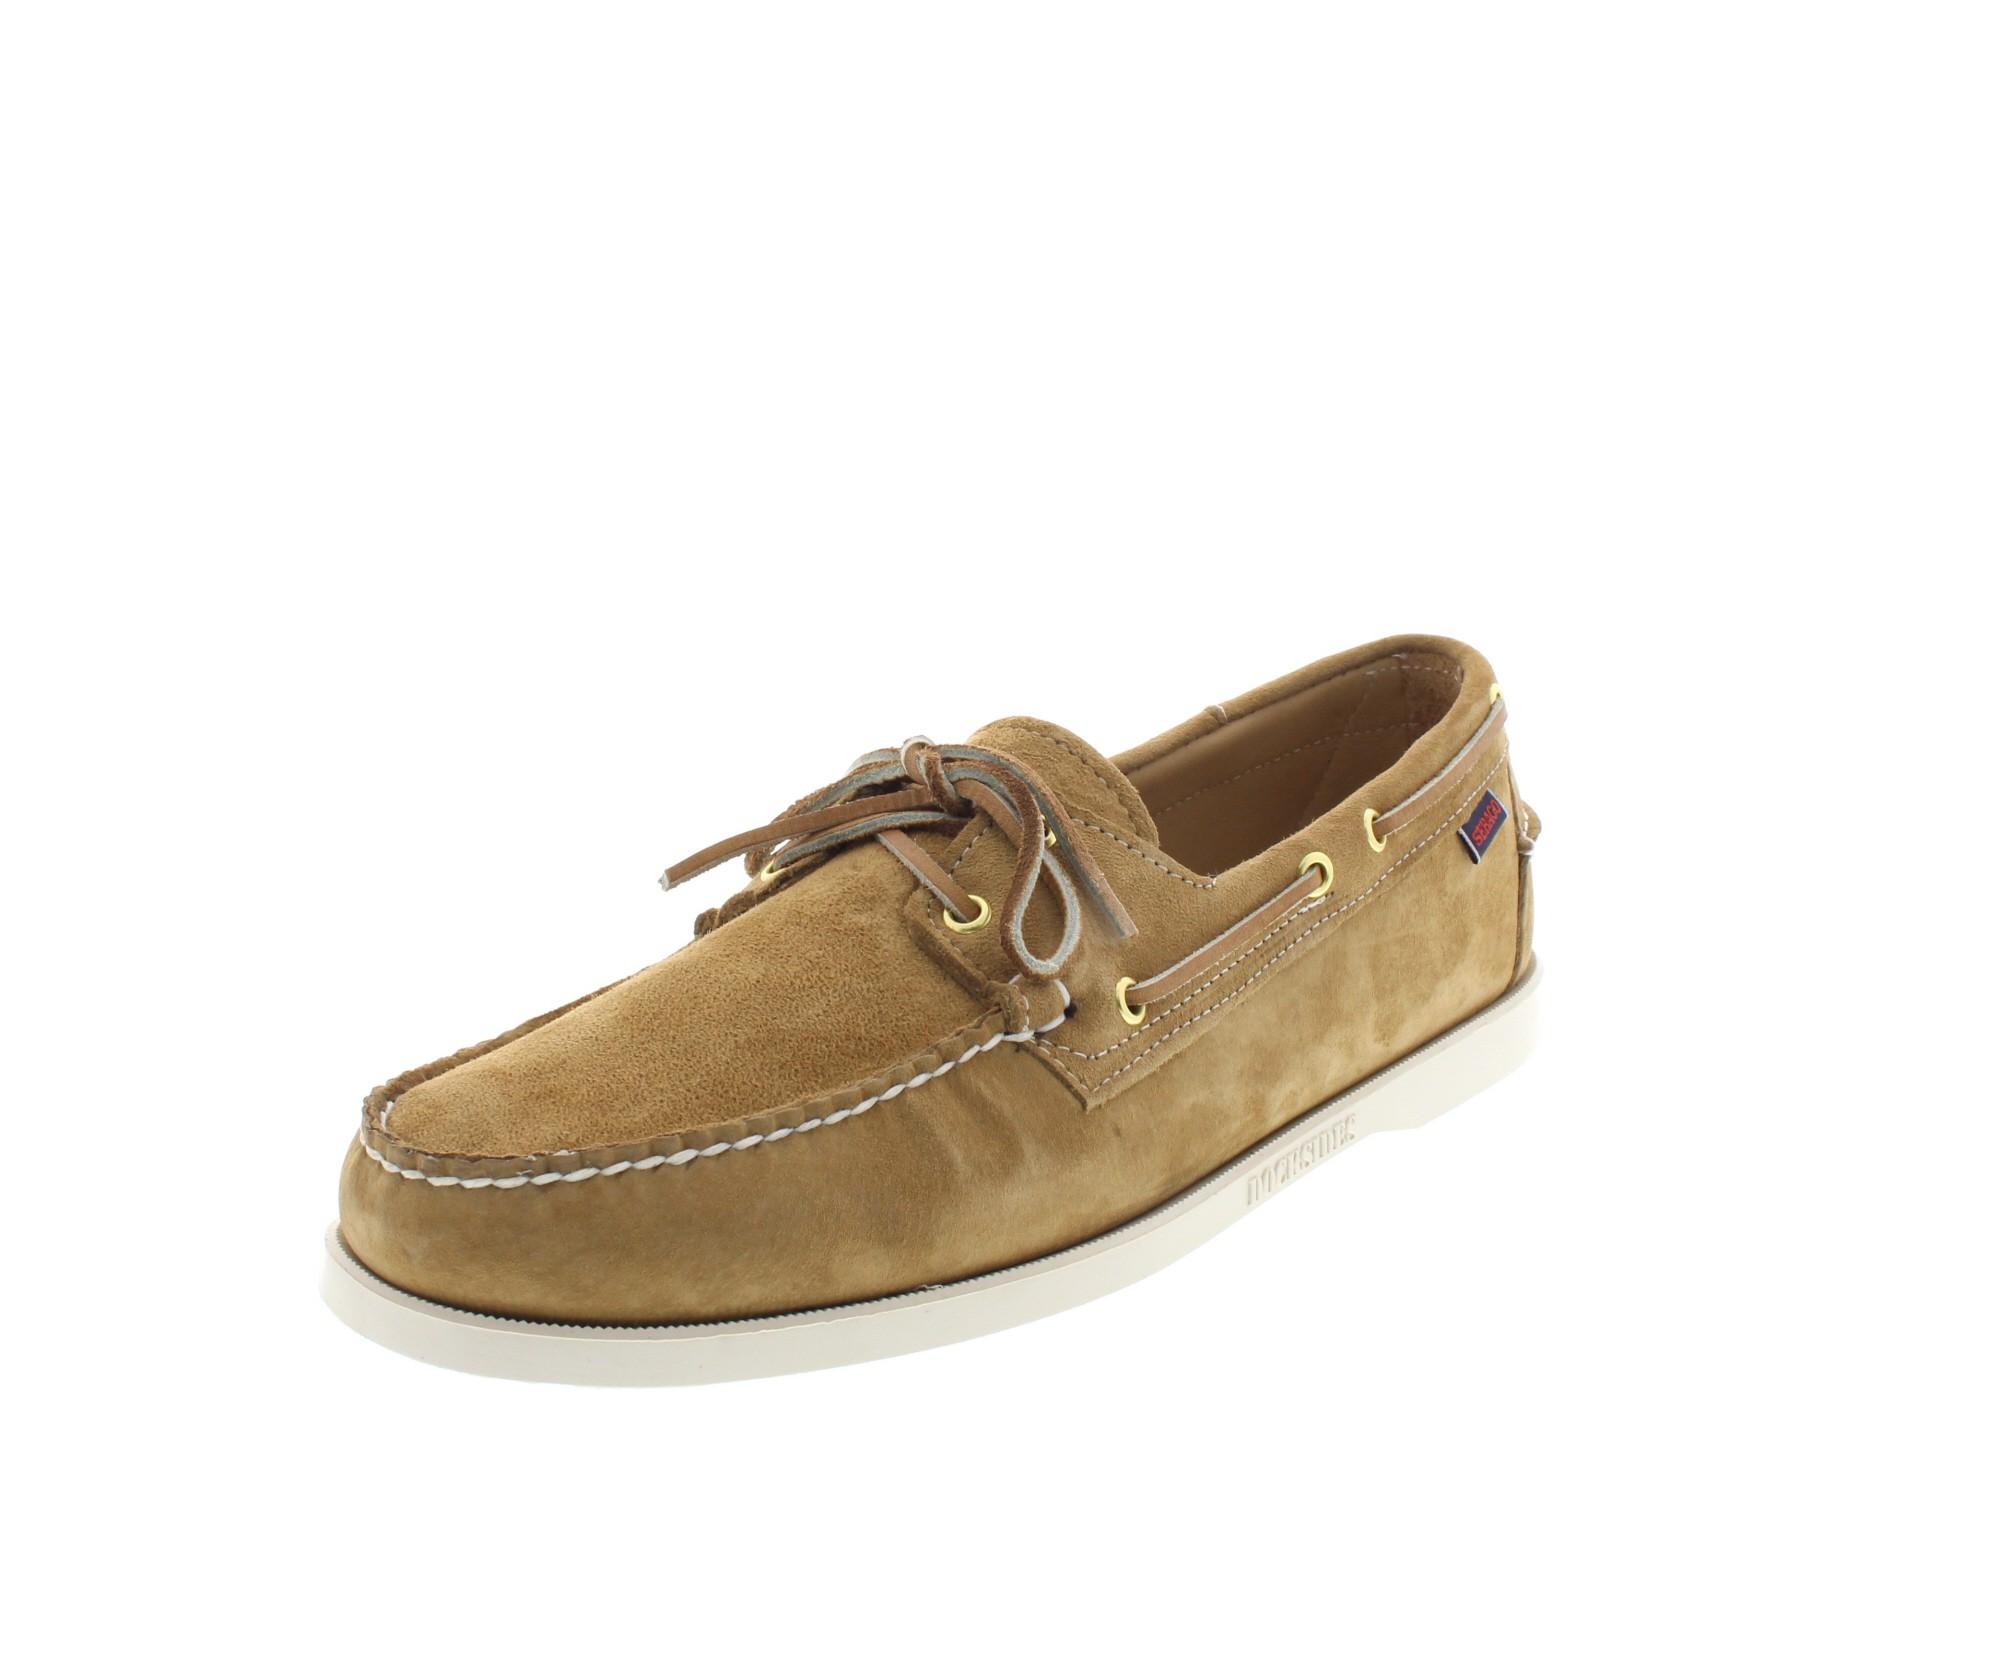 SEBAGO Schuhe in Übergröße - DOCKSIDES - sand suede